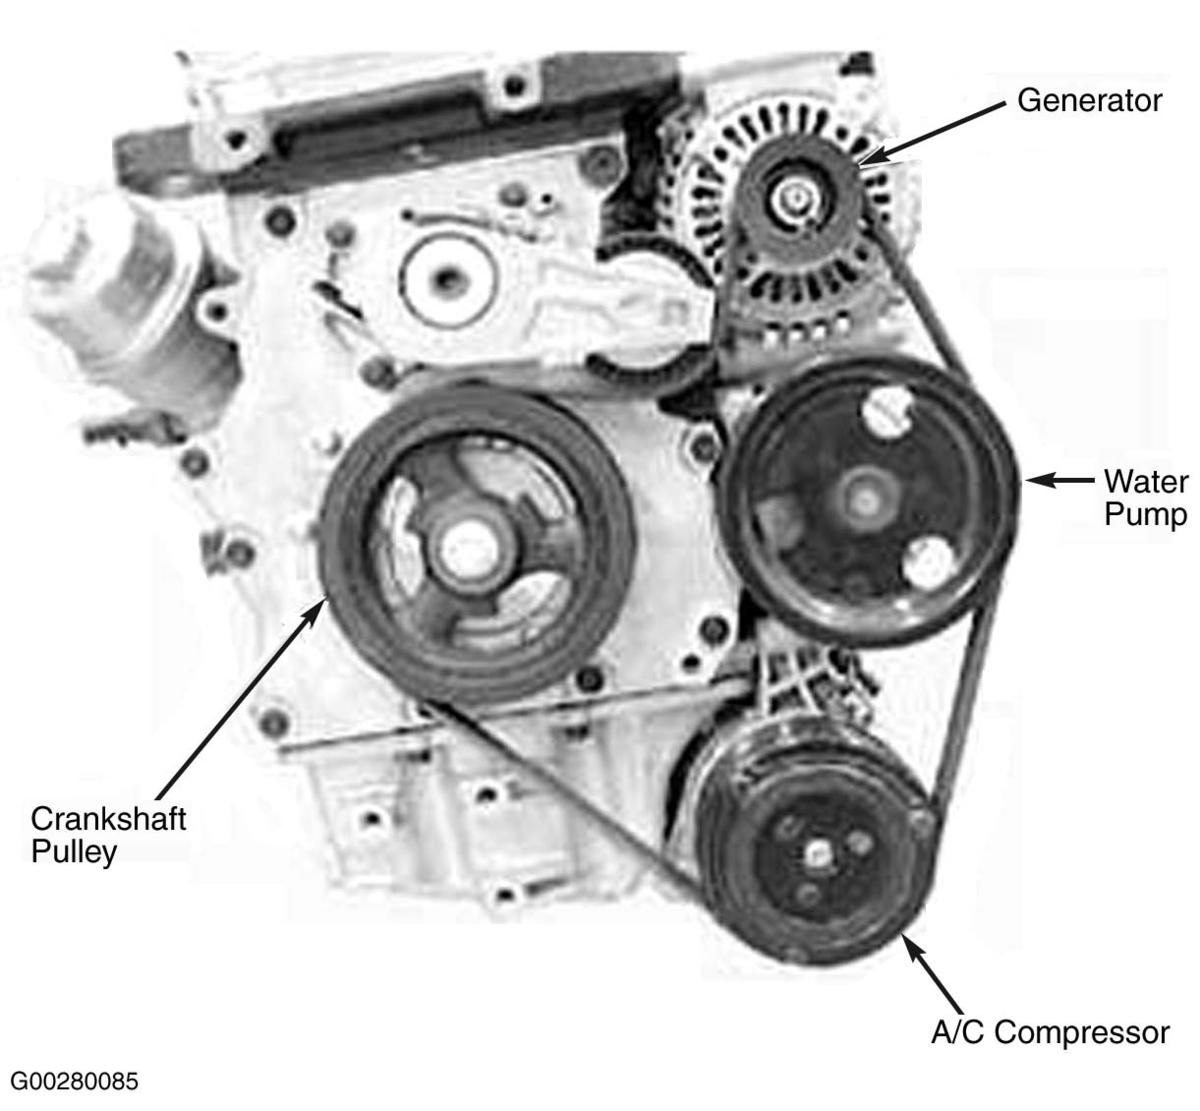 2005 mini cooper s engine diagram wiring diagram directory 4.0 jeep wrangler engine diagram pictures mini cooper 2010 engine diagram group